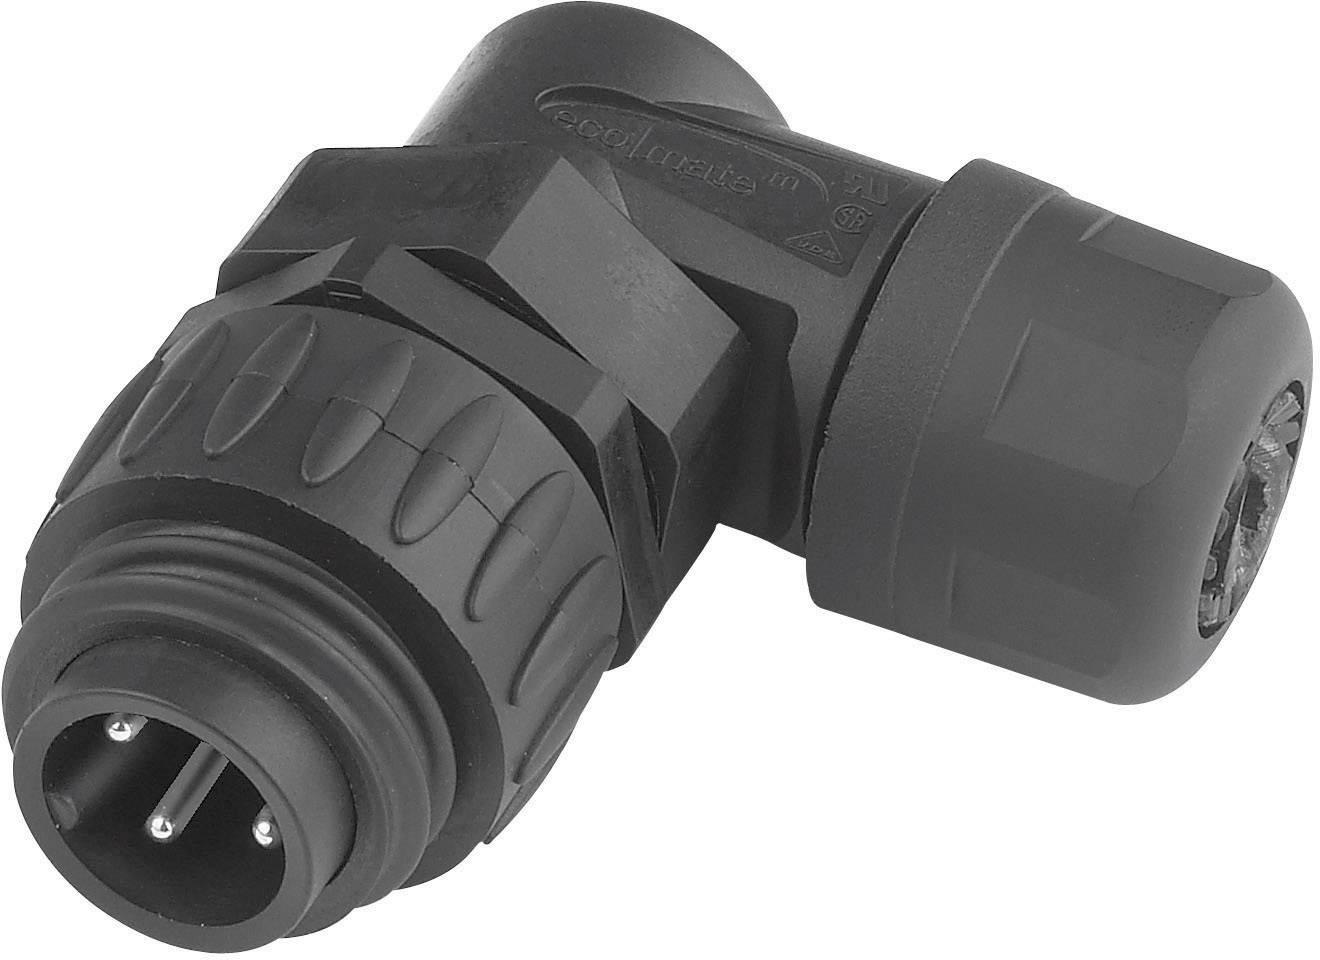 Kabelový konektor 3+PE Amphenol C016 20K003 100 12, černá